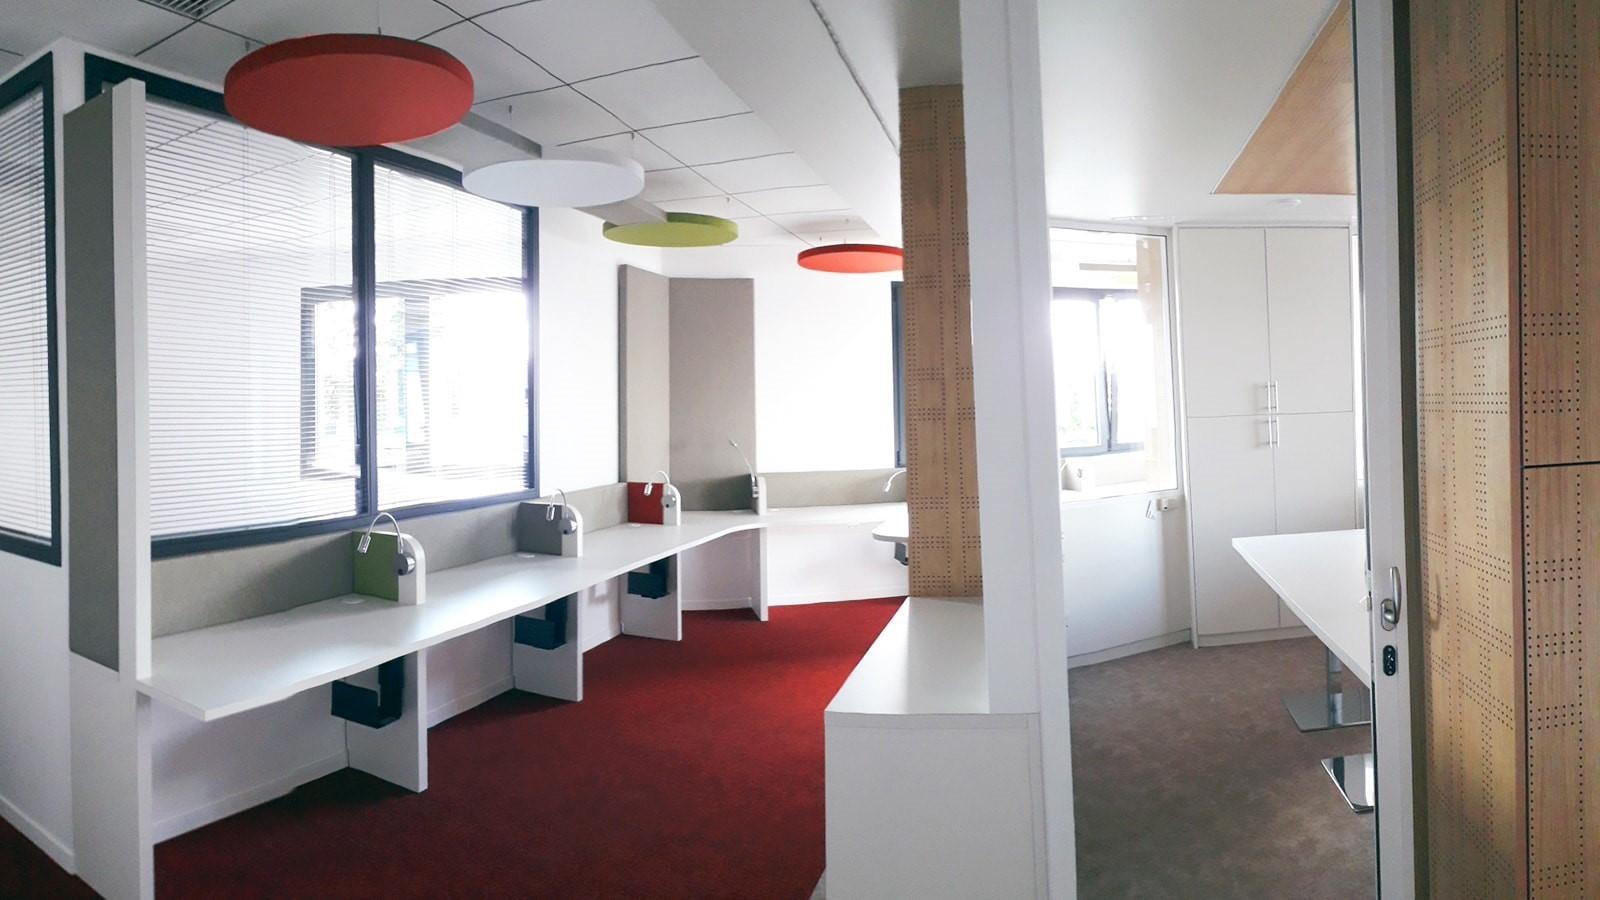 Bureaux Had Cholet Efi Design (5)